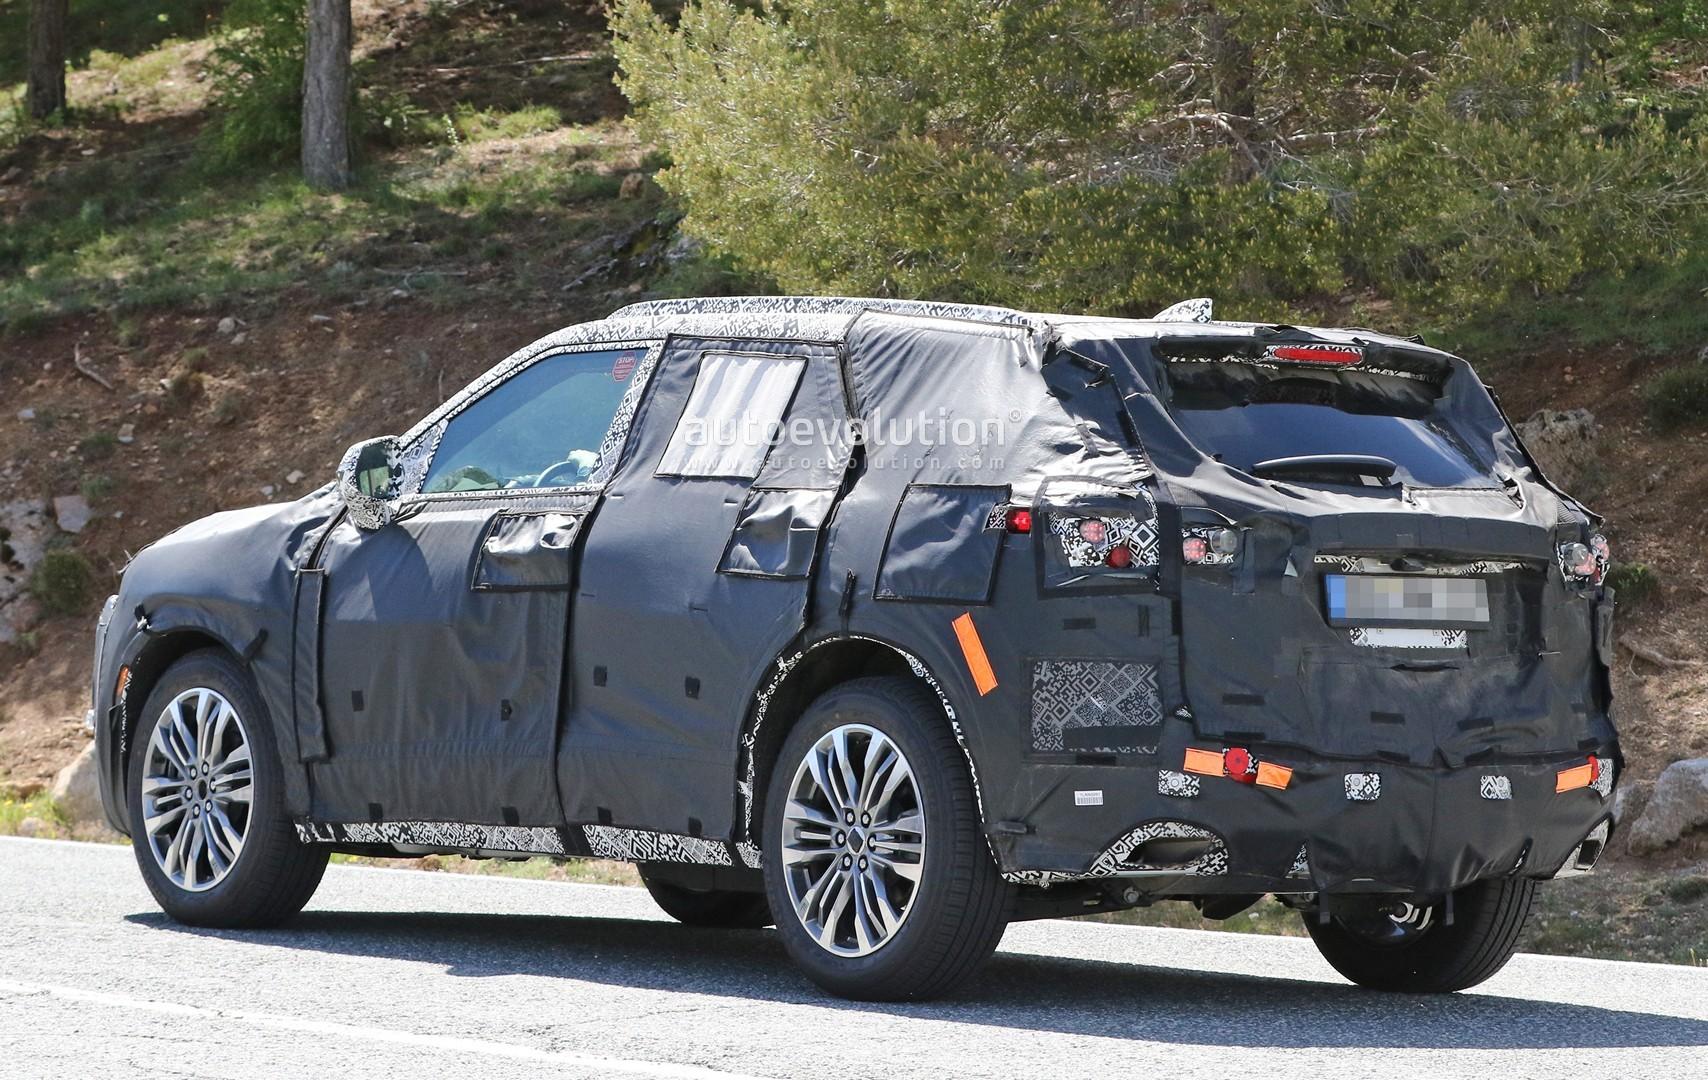 2019 New Chevy Blazer Shows Sporty Styling, LED Headlights ...